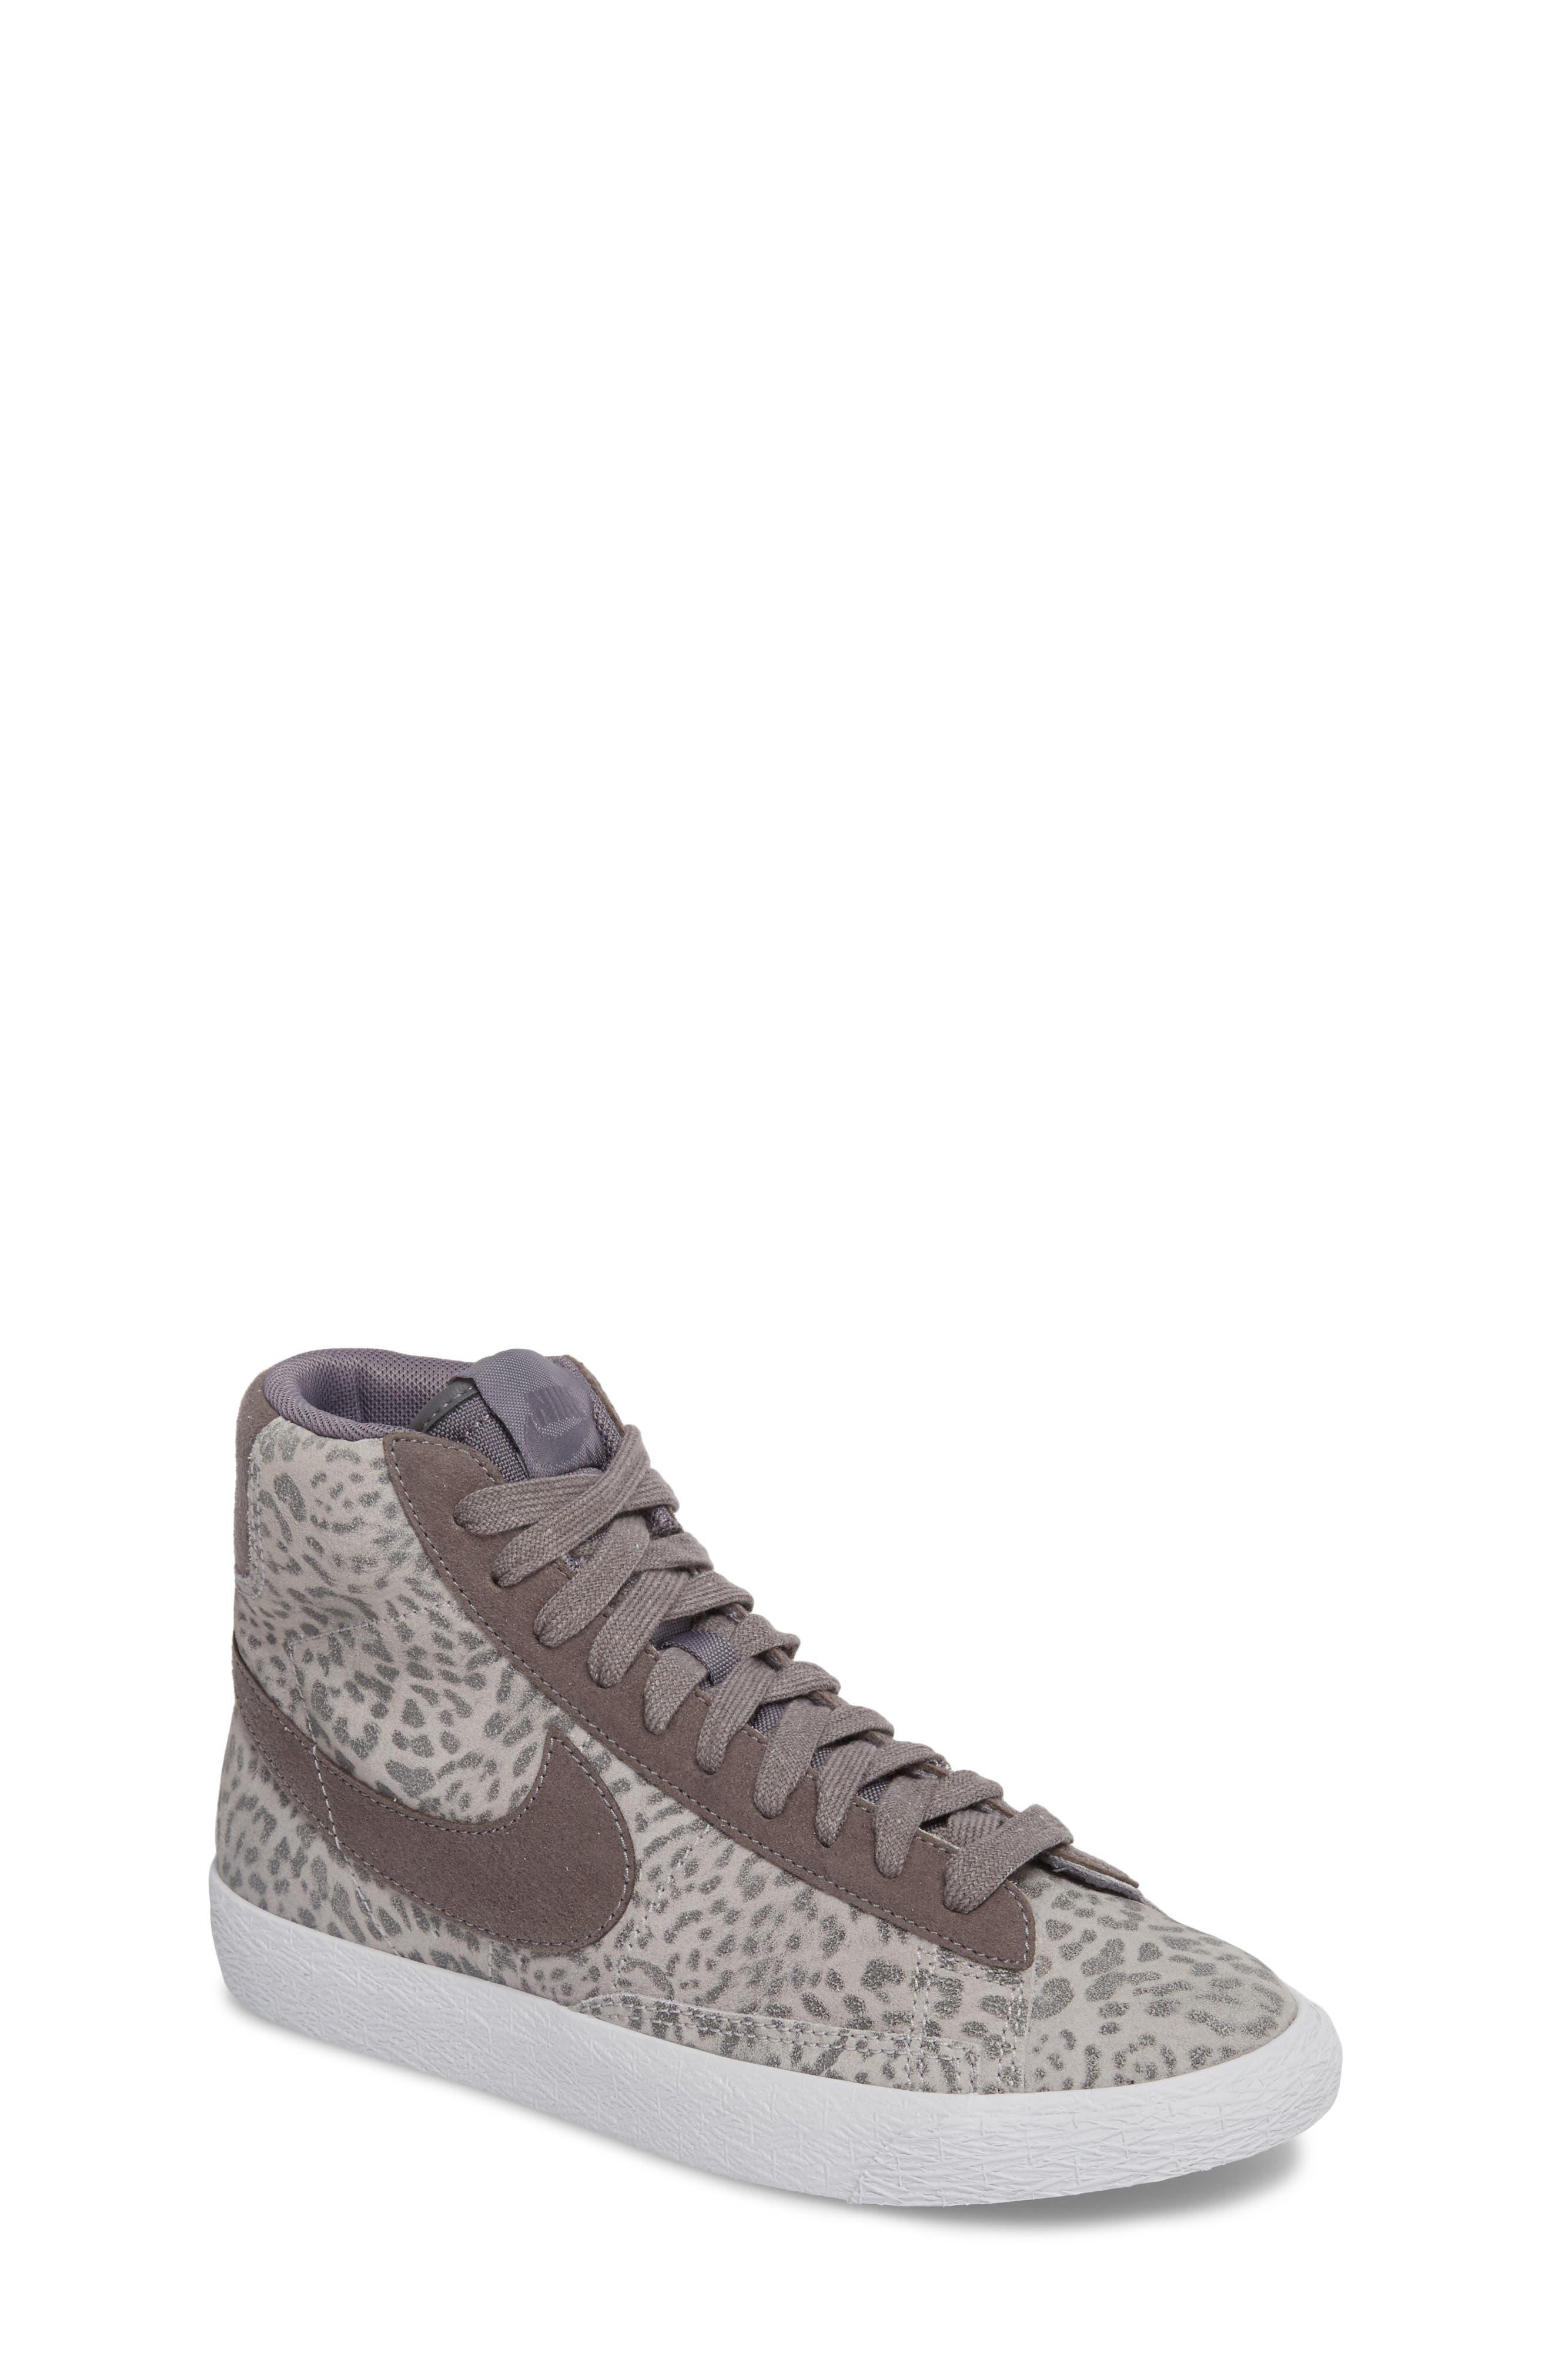 Blazer Mid SE High Top Sneaker,                             Main thumbnail 1, color,                             Atmosphere Grey/ Smoke/ Gum